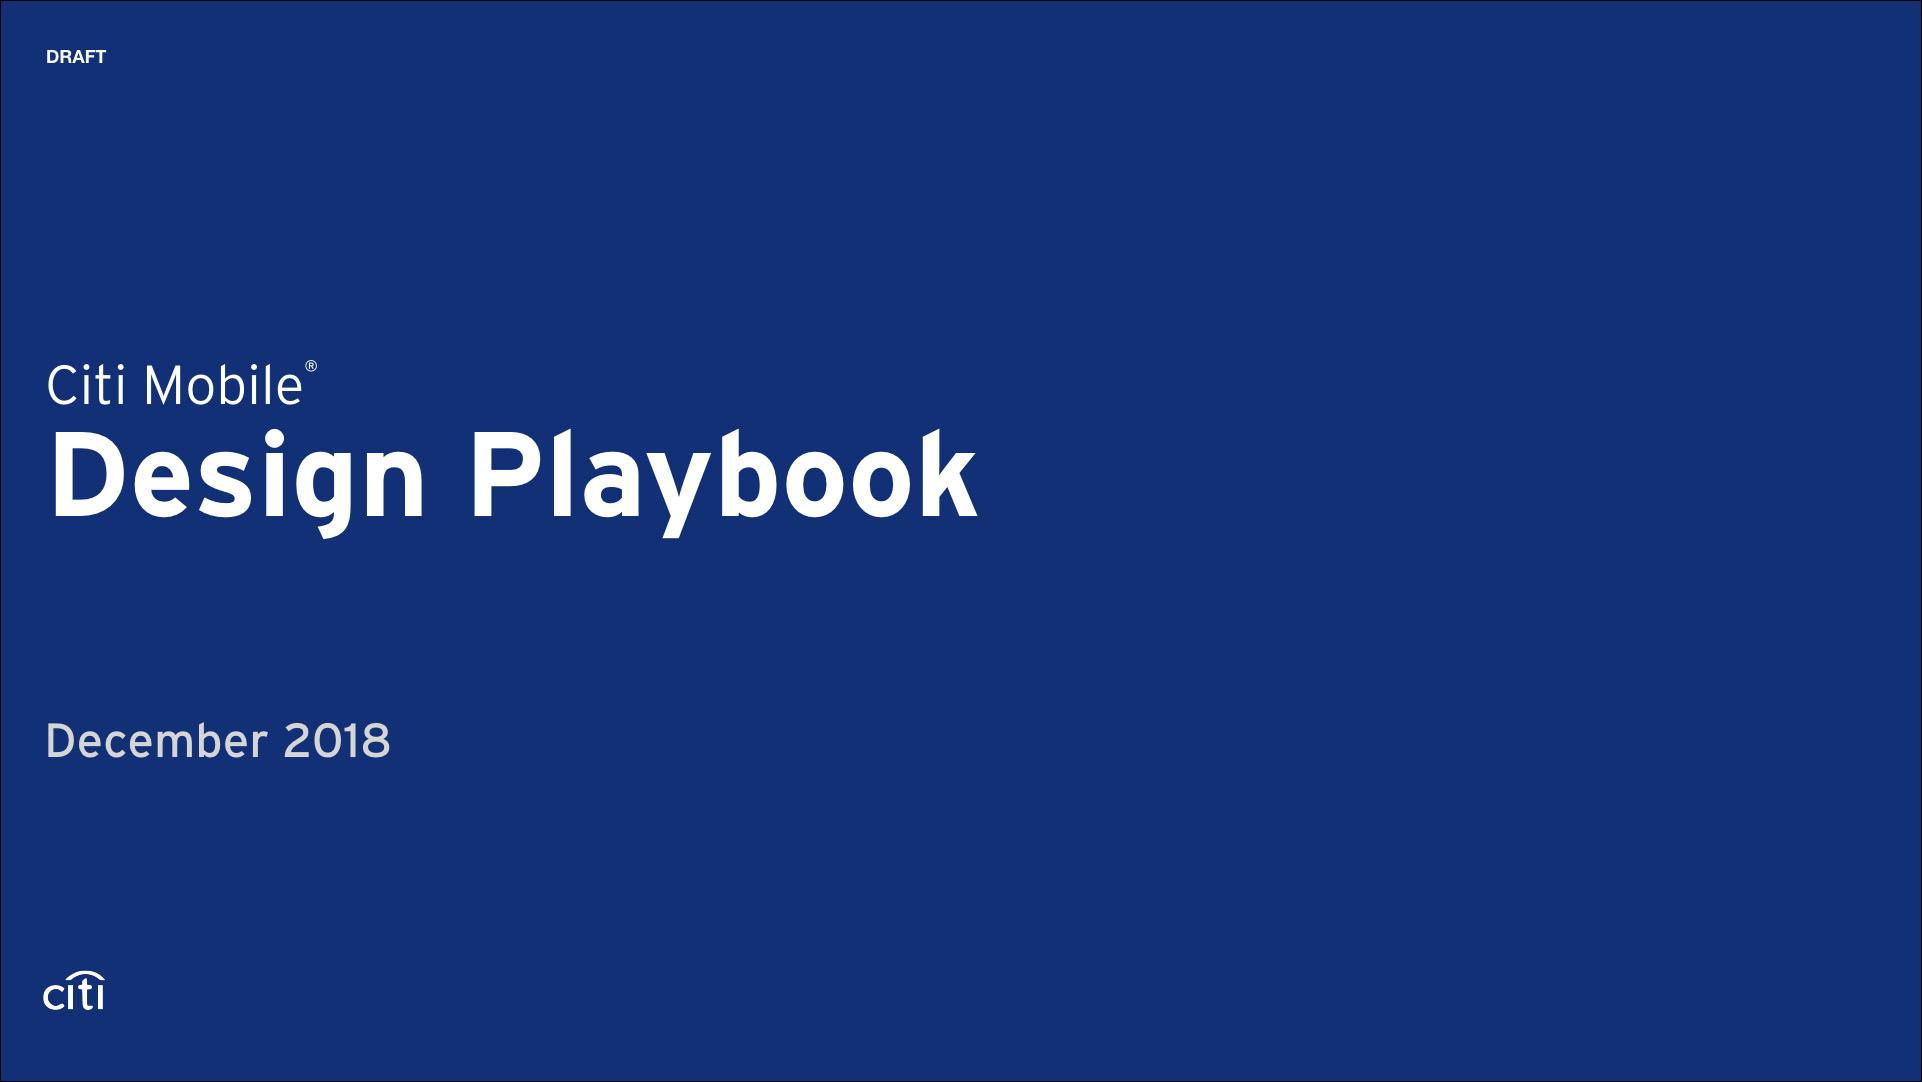 CitiMobile_DesignPlaybook_20181130.001.jpeg